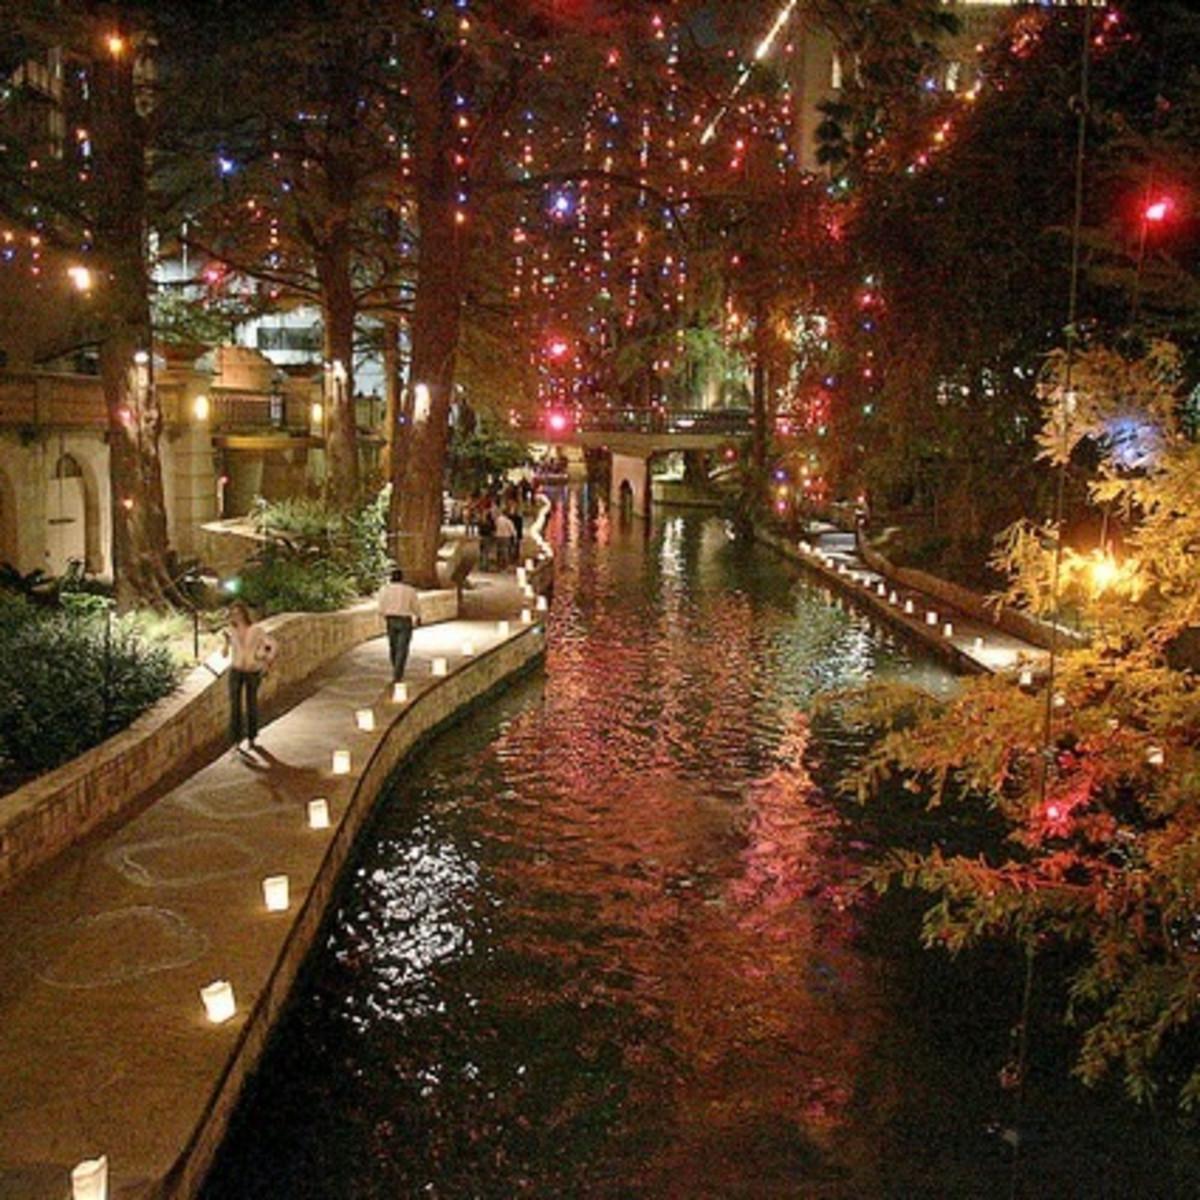 Ford Fiesta de Luminarias River Walk Holiday Christmas